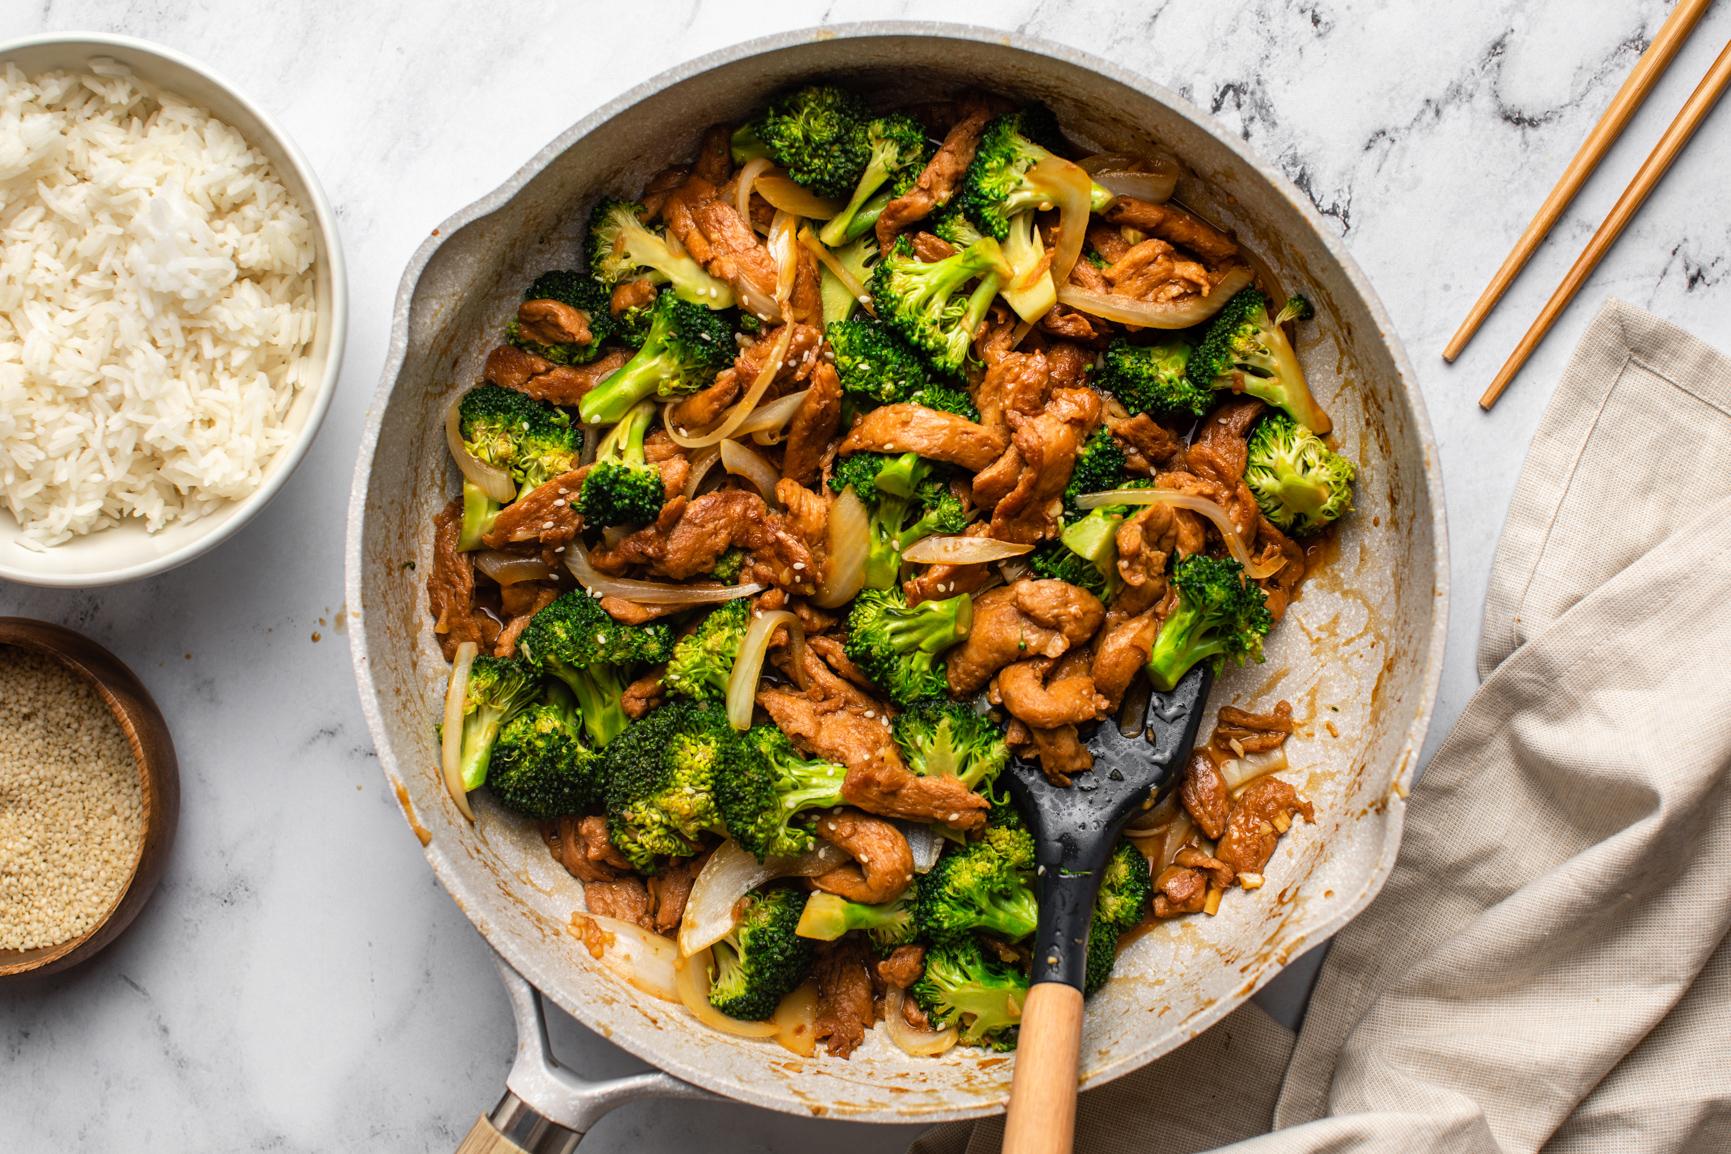 Keto Beef and Broccoli Getfitqueen.com